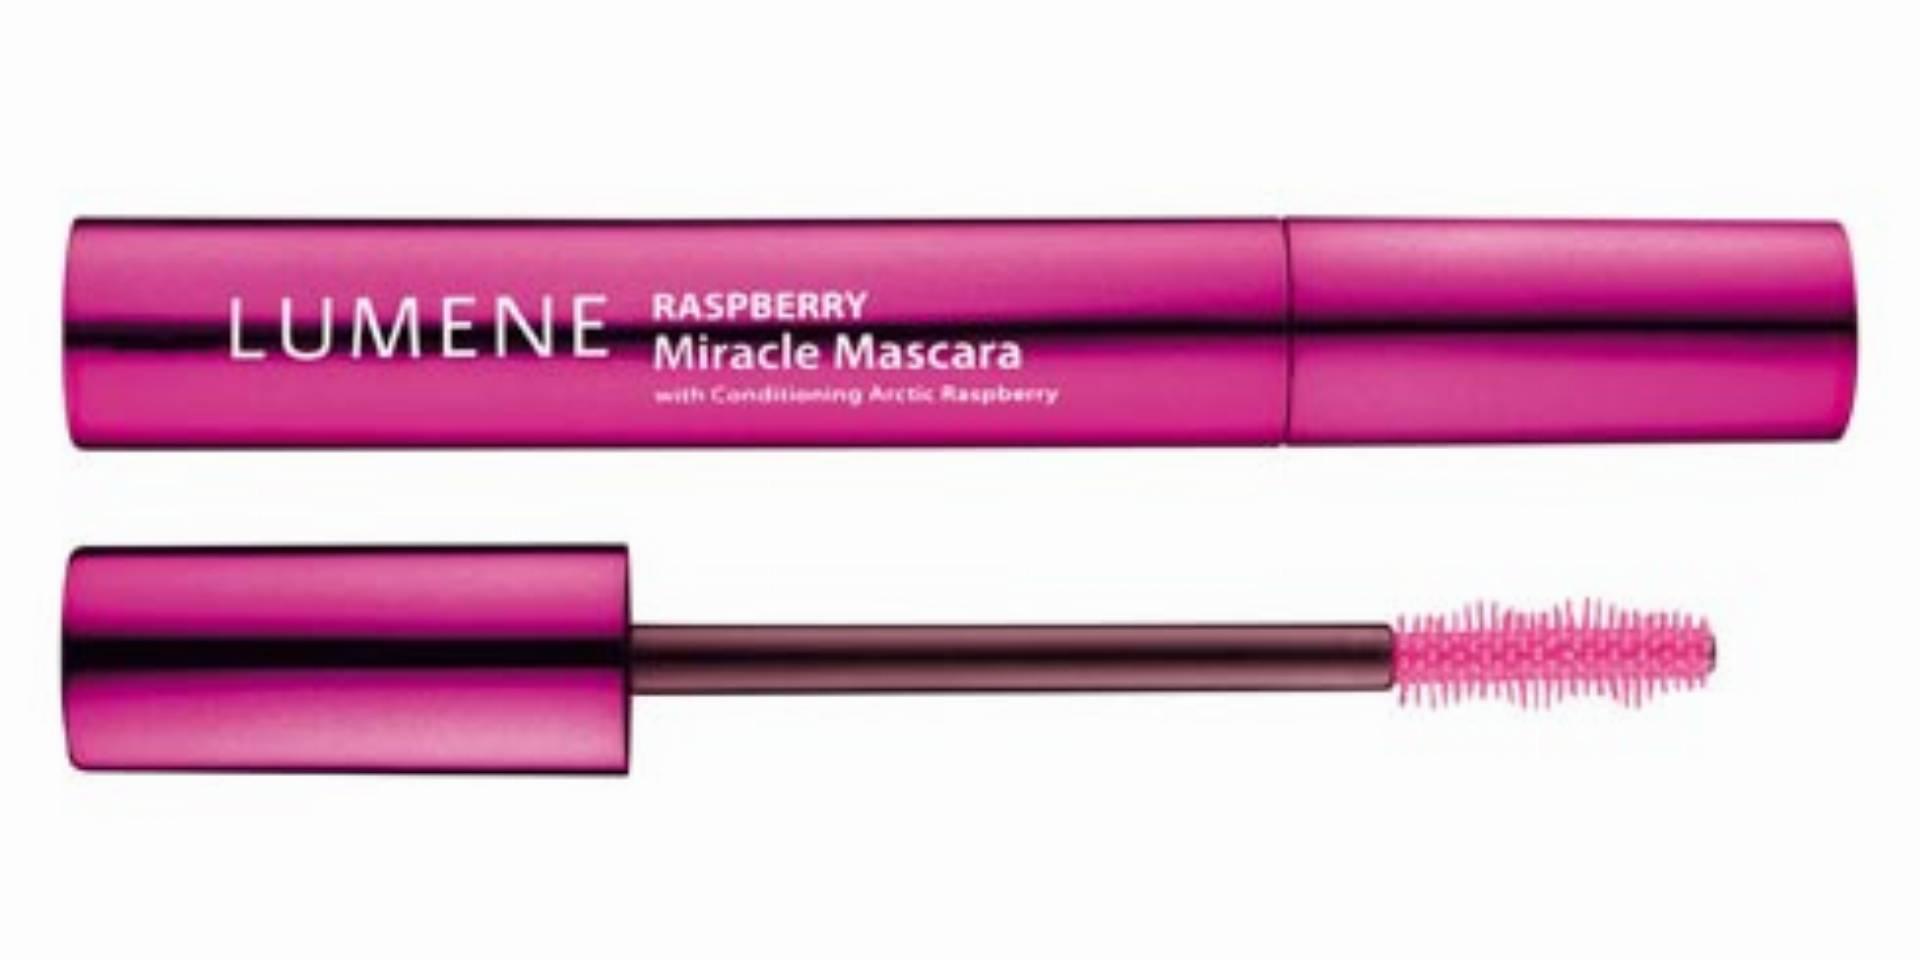 LUMENE Rasberry Miracle Mascara